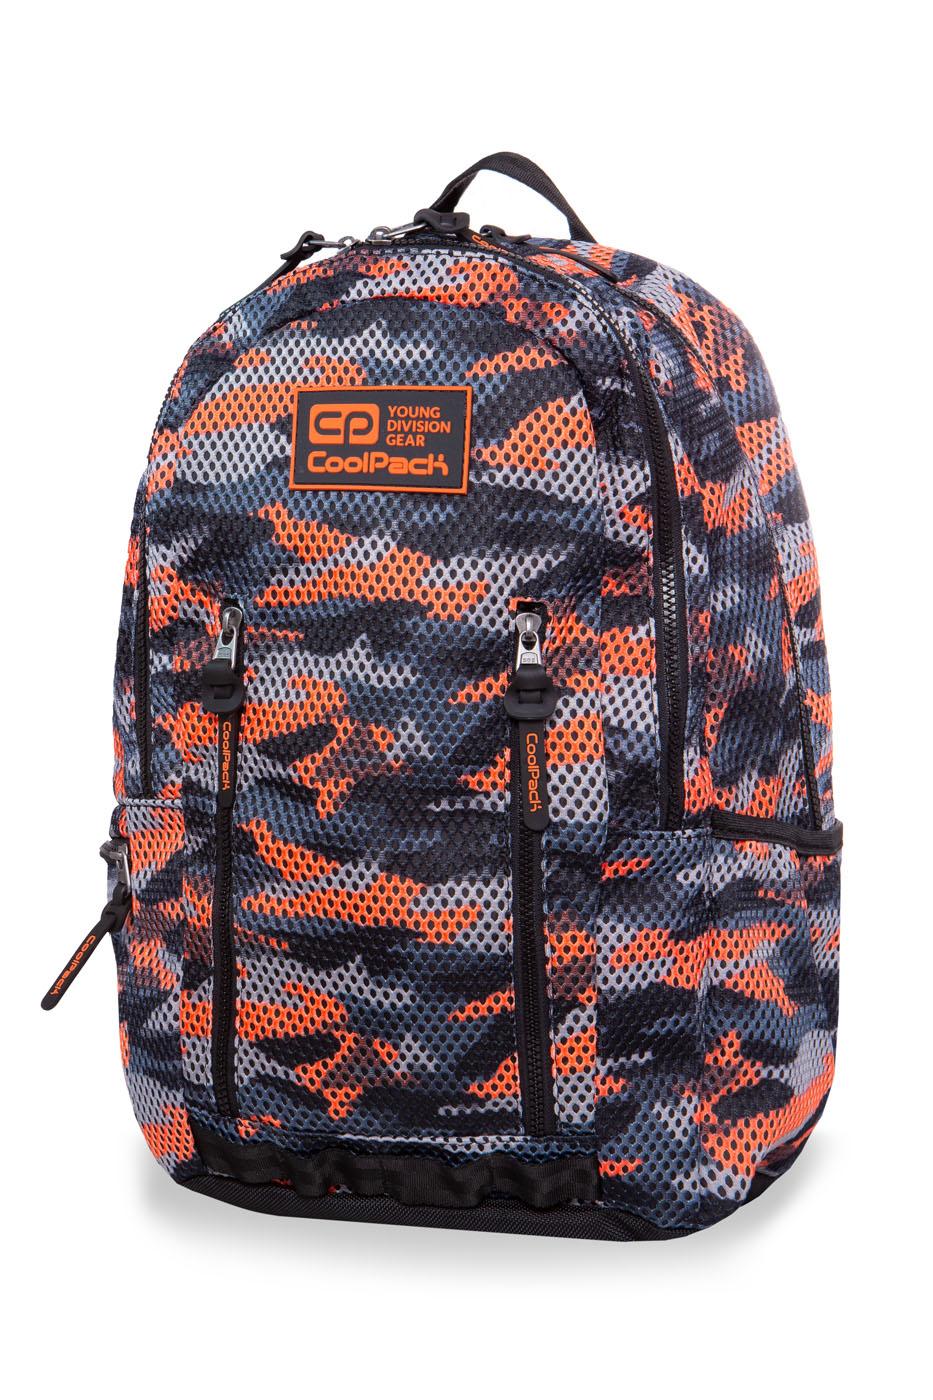 Coolpack - impact ii - youth backpack - camo mesh orange